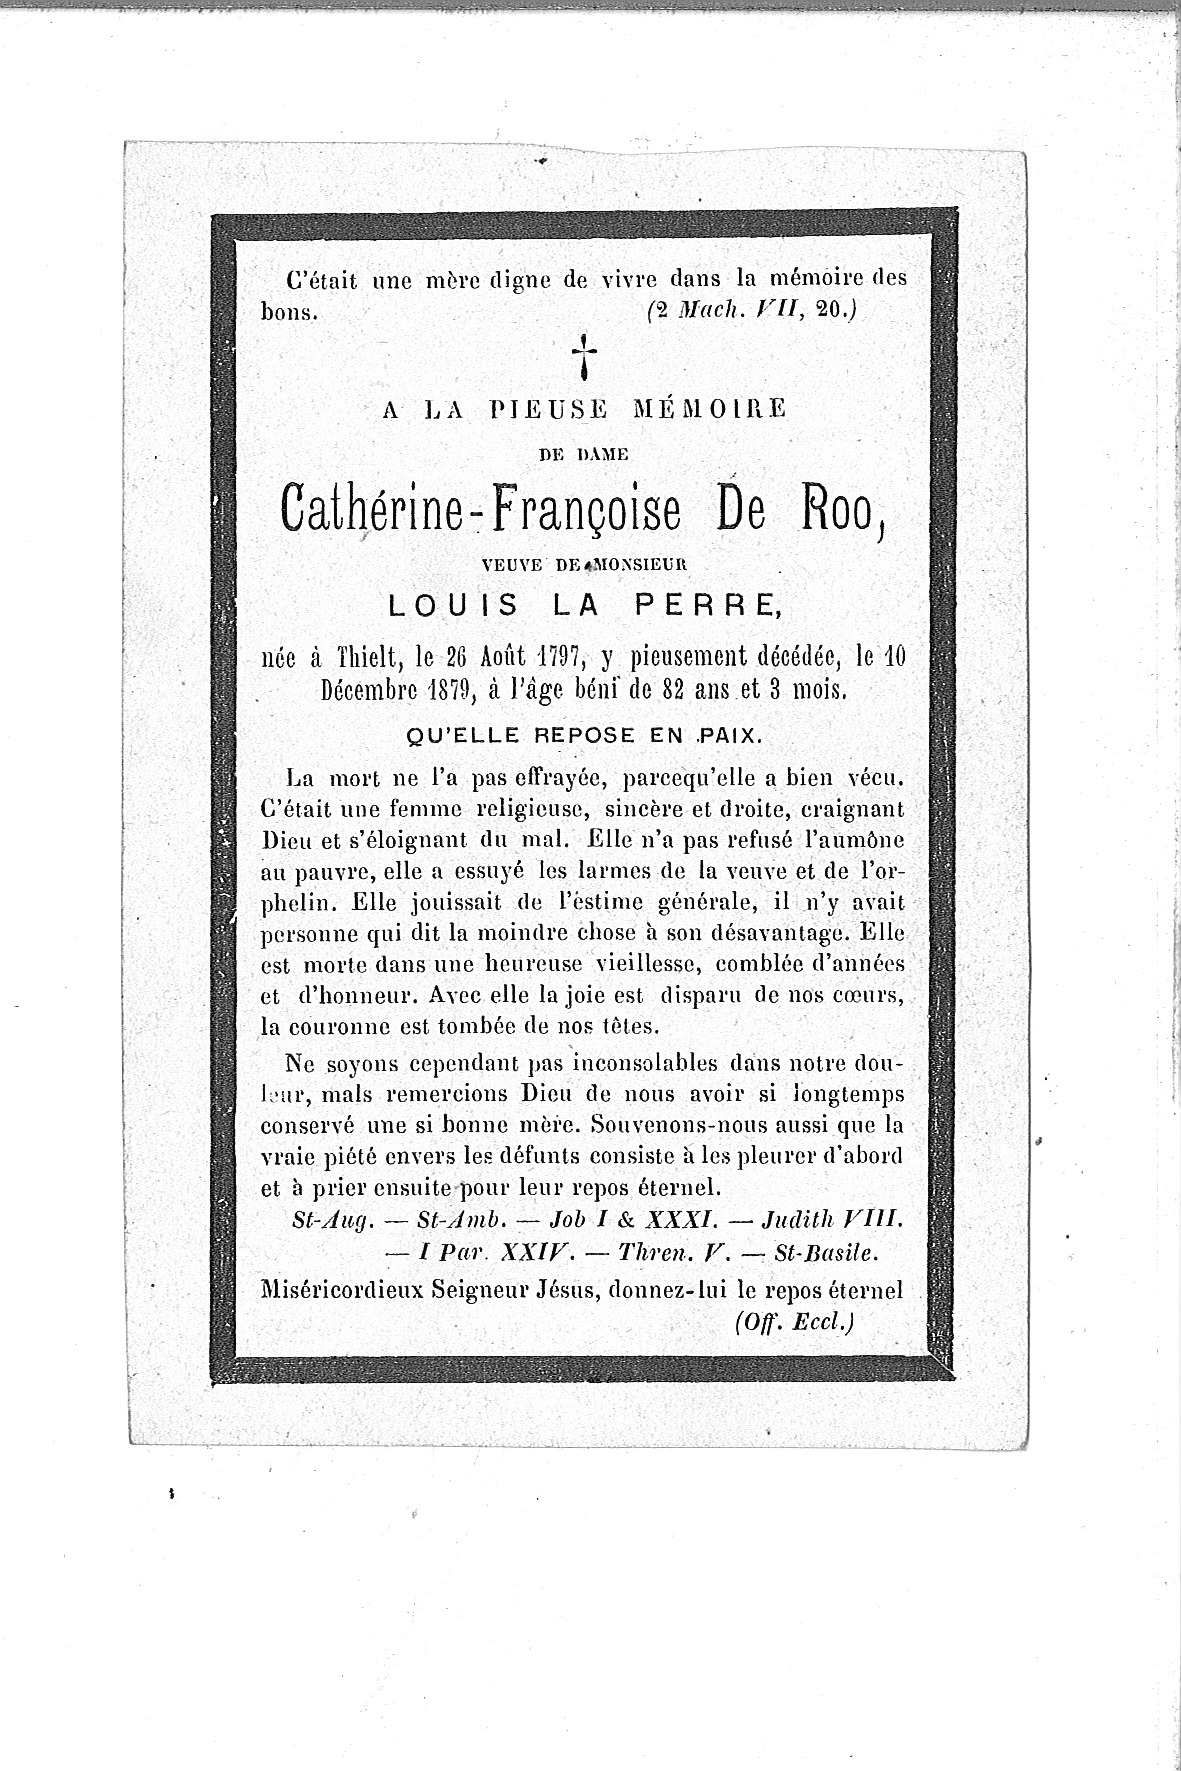 Cathérine-Françoise-(1879)-20120814085427_00271.jpg